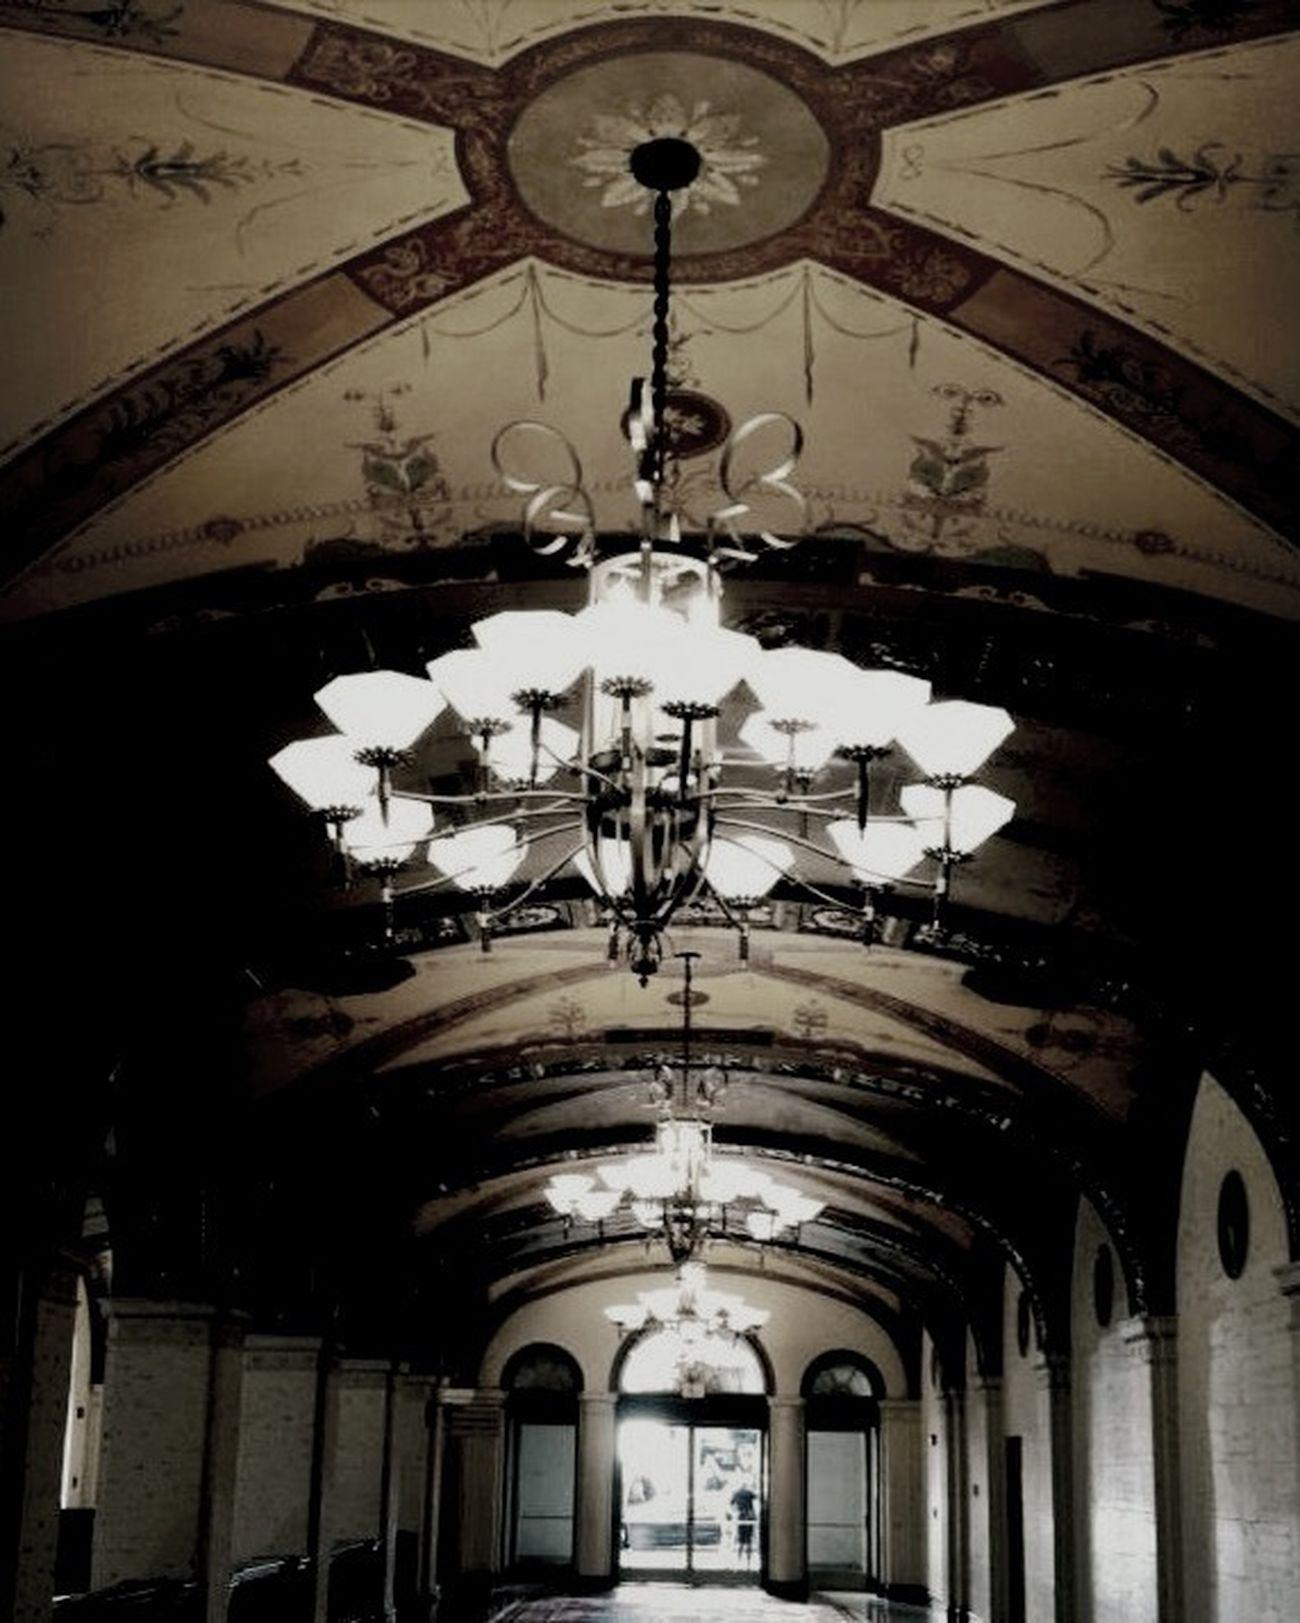 Historic Biltmore Hotel